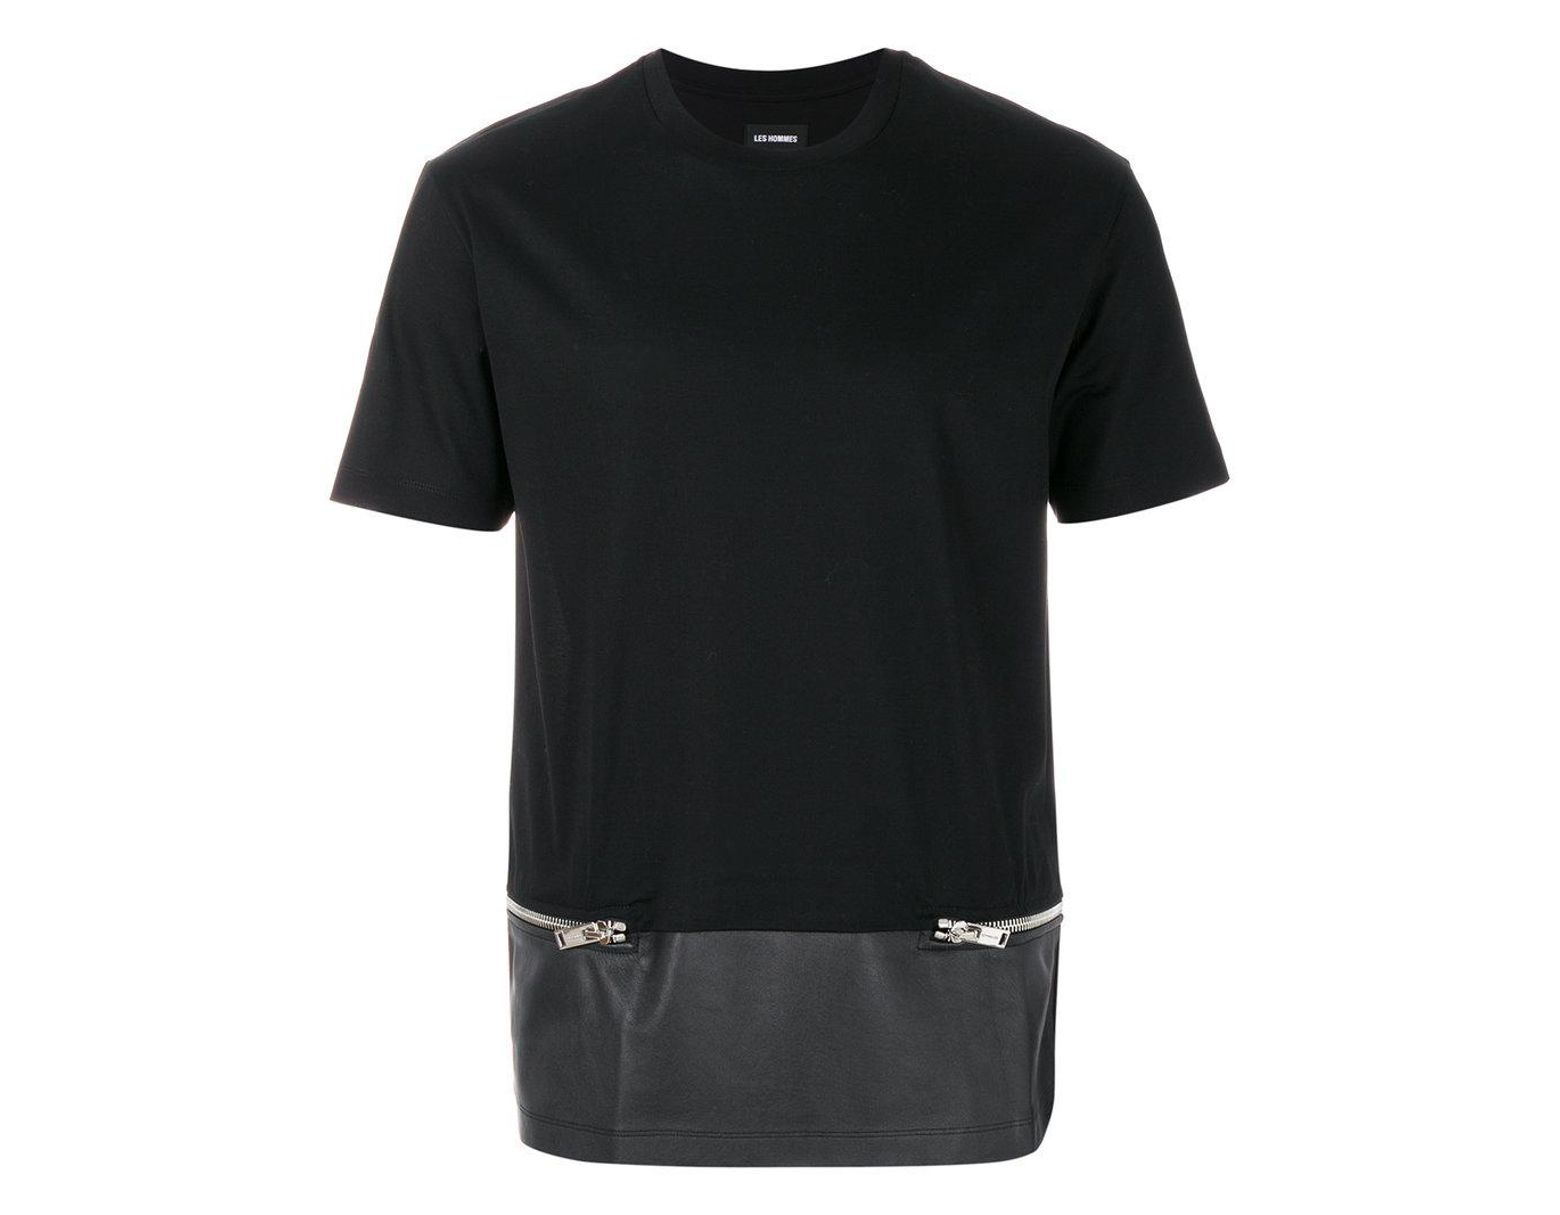 7a9a26d670b Lyst - Les Hommes Zip Embellished T-shirt in Black for Men